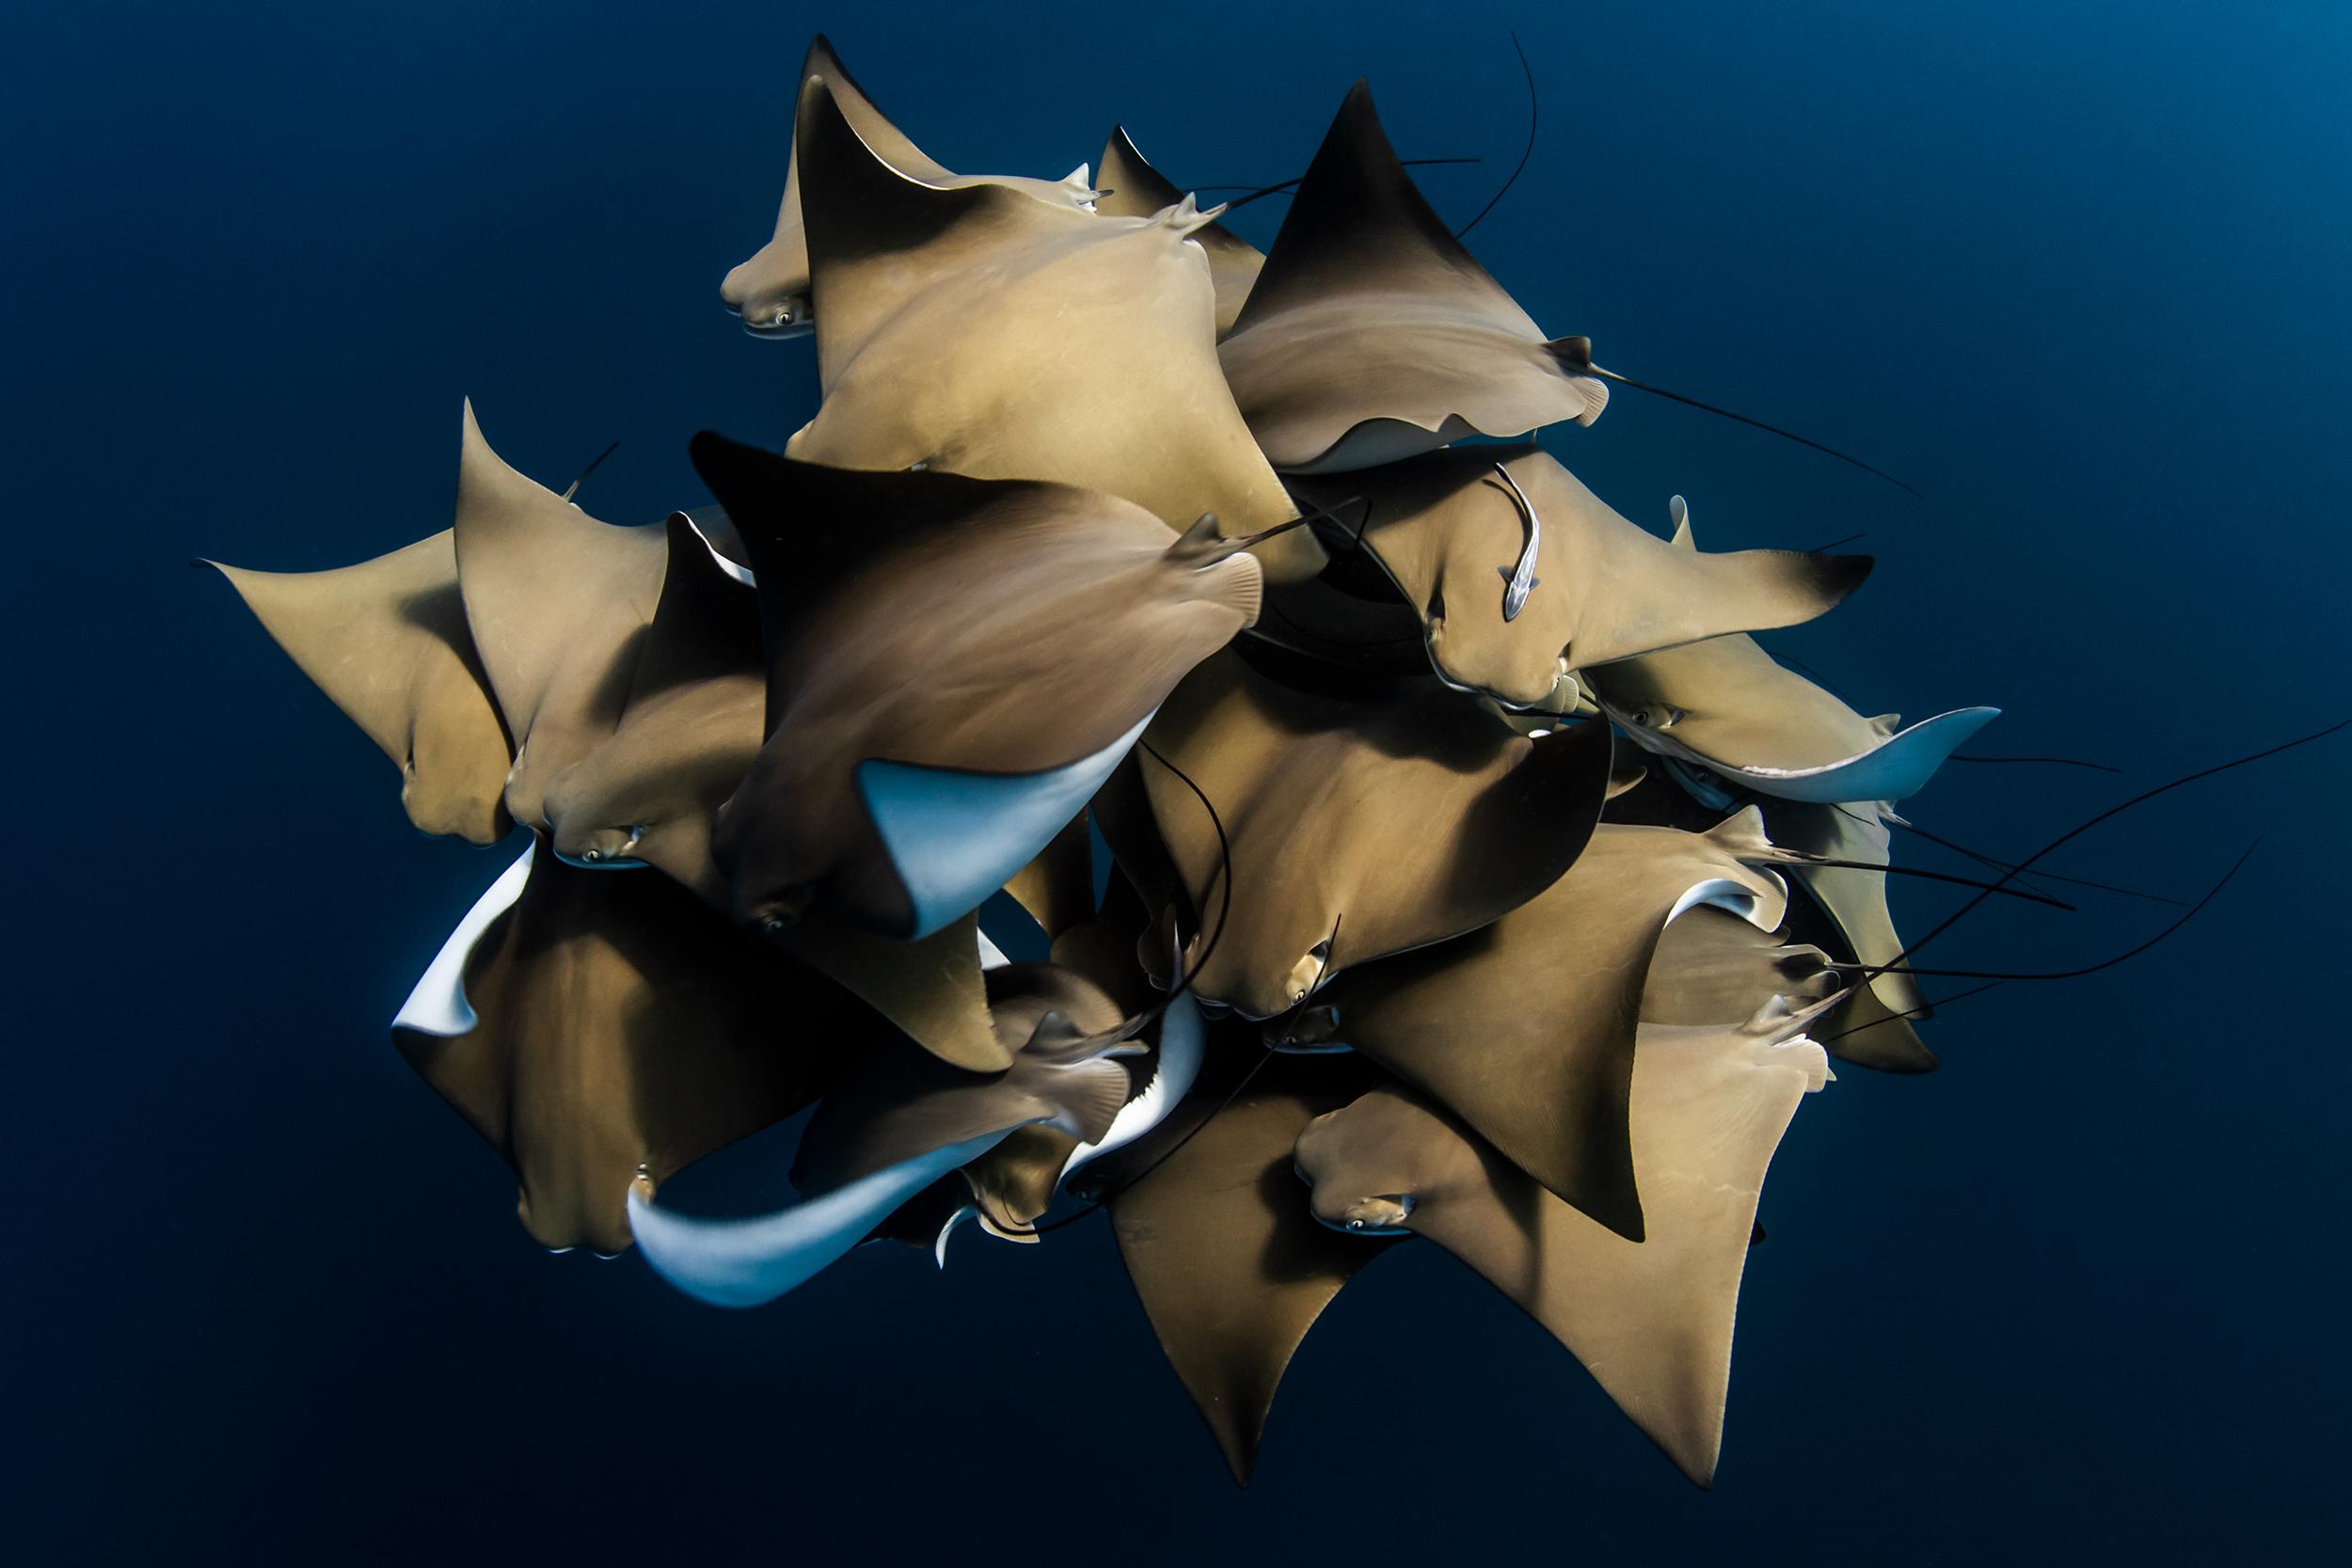 © Alex Kydd, Australia, Shortlist, Open, Natural World & Wildlife, 2020 Sony World Photography Awards